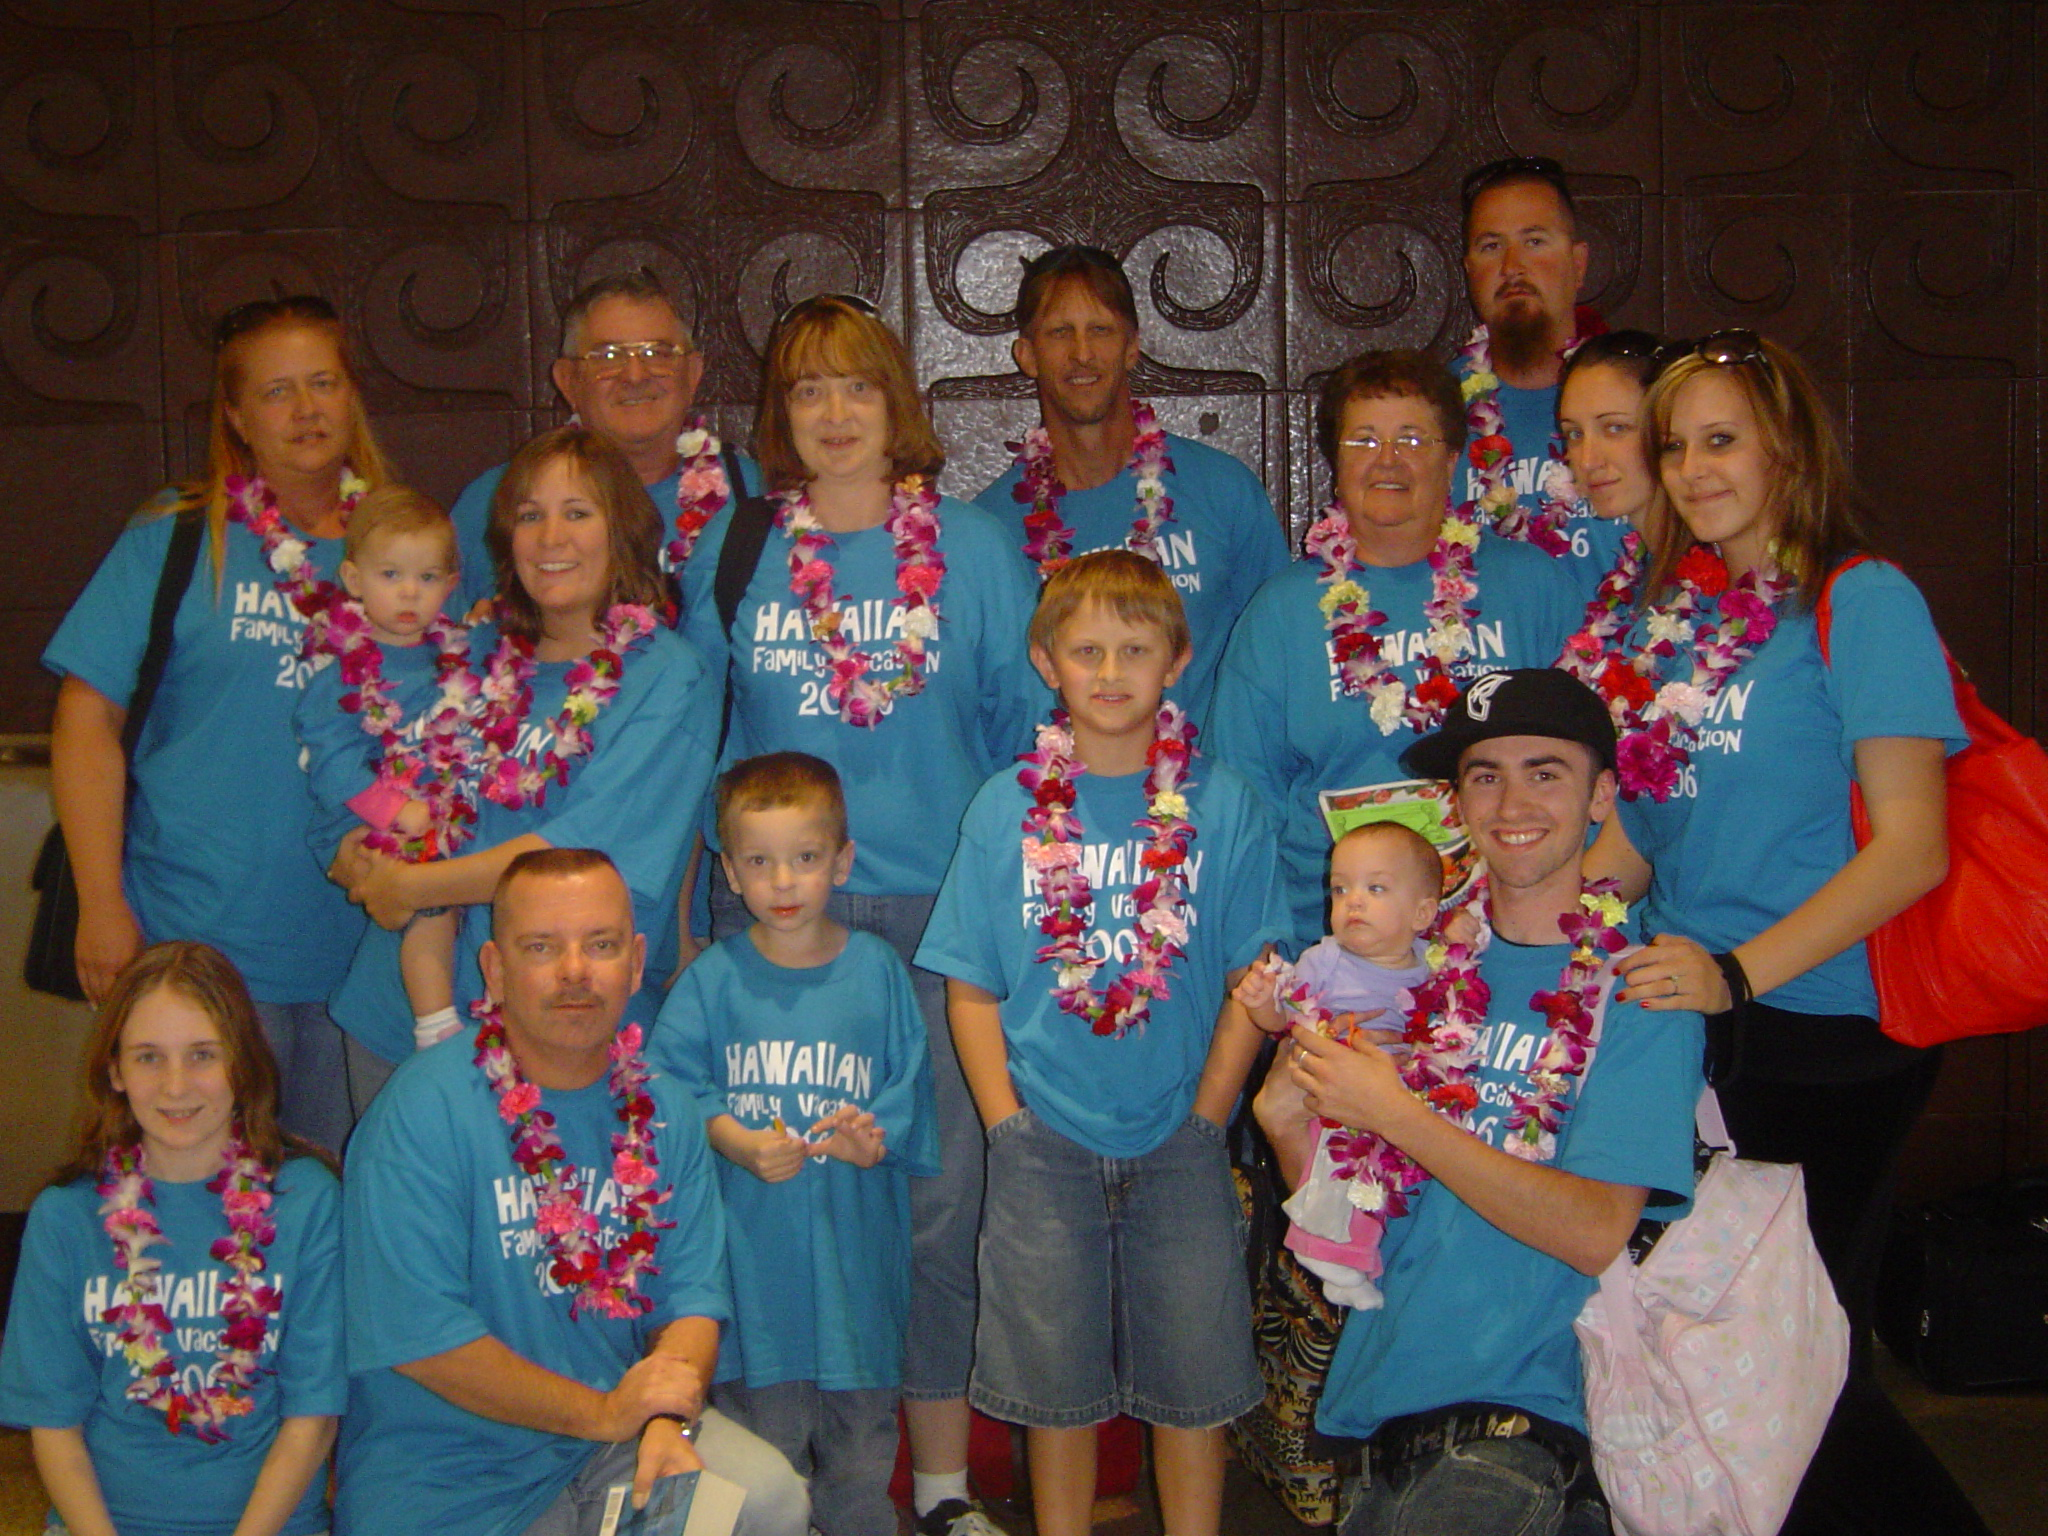 T shirt design hawaii - Hawaiian Family Vaction T Shirt Photo